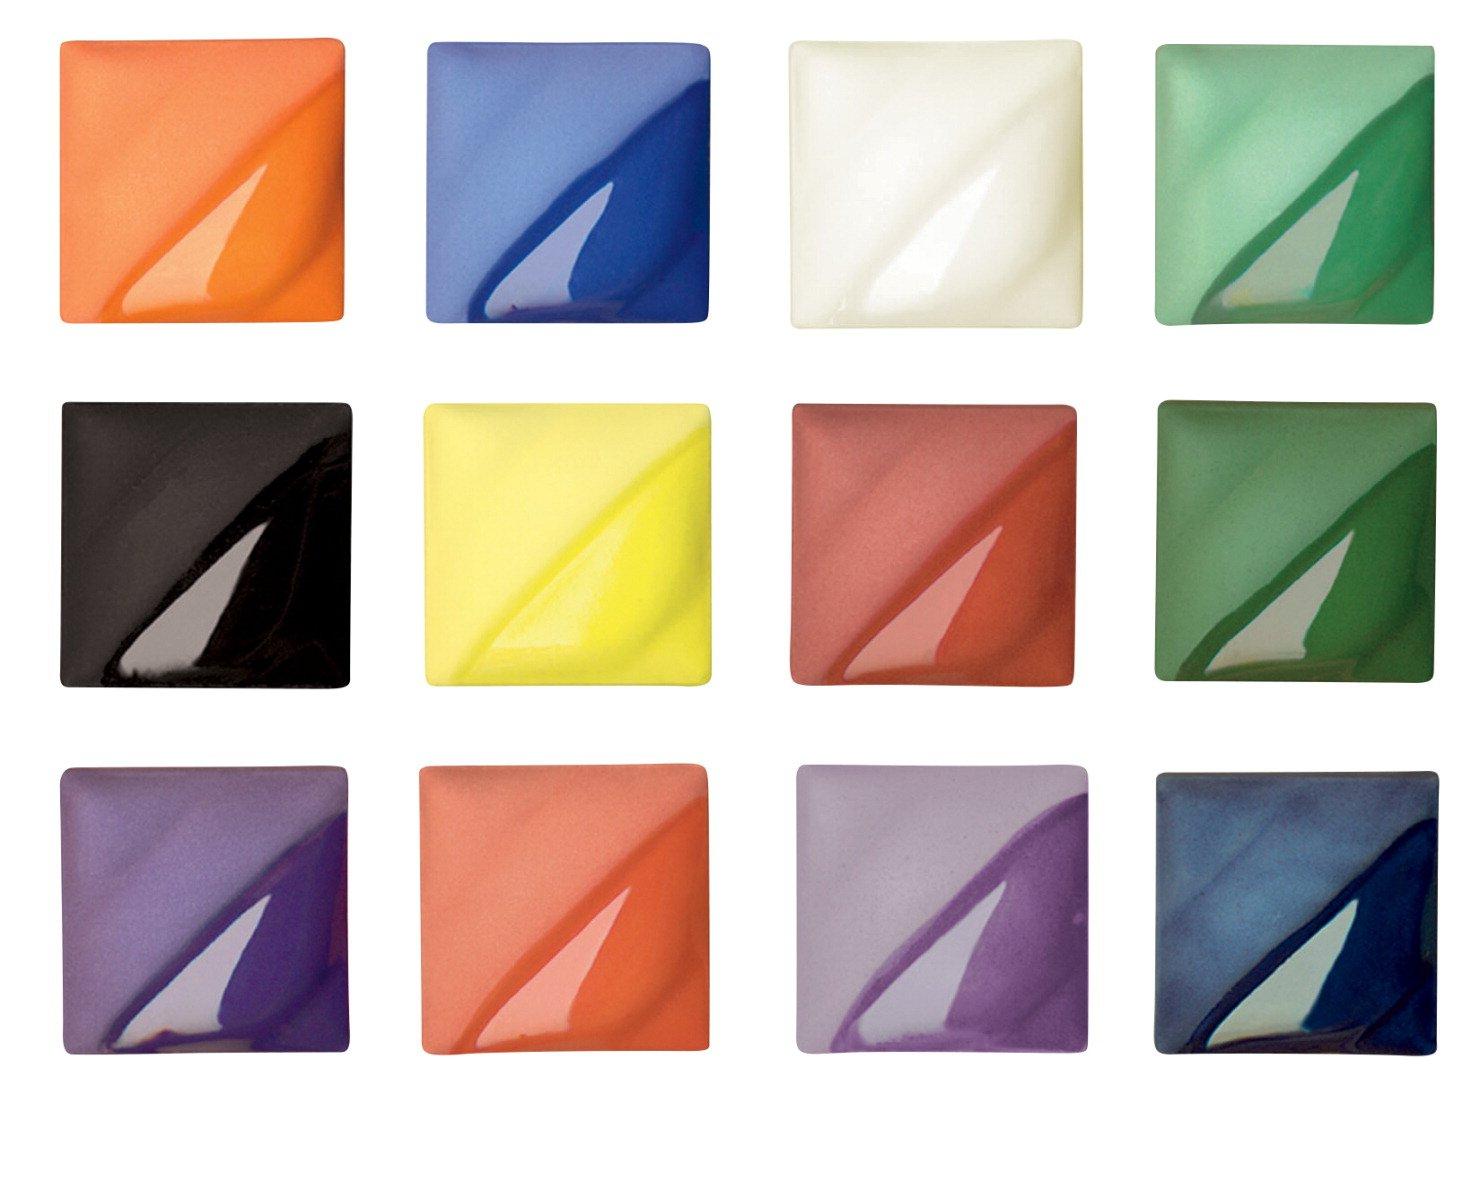 AMACO Velvet Semi-Translucent Underglaze Classroom Pack, Assorted Colors, Set of 12